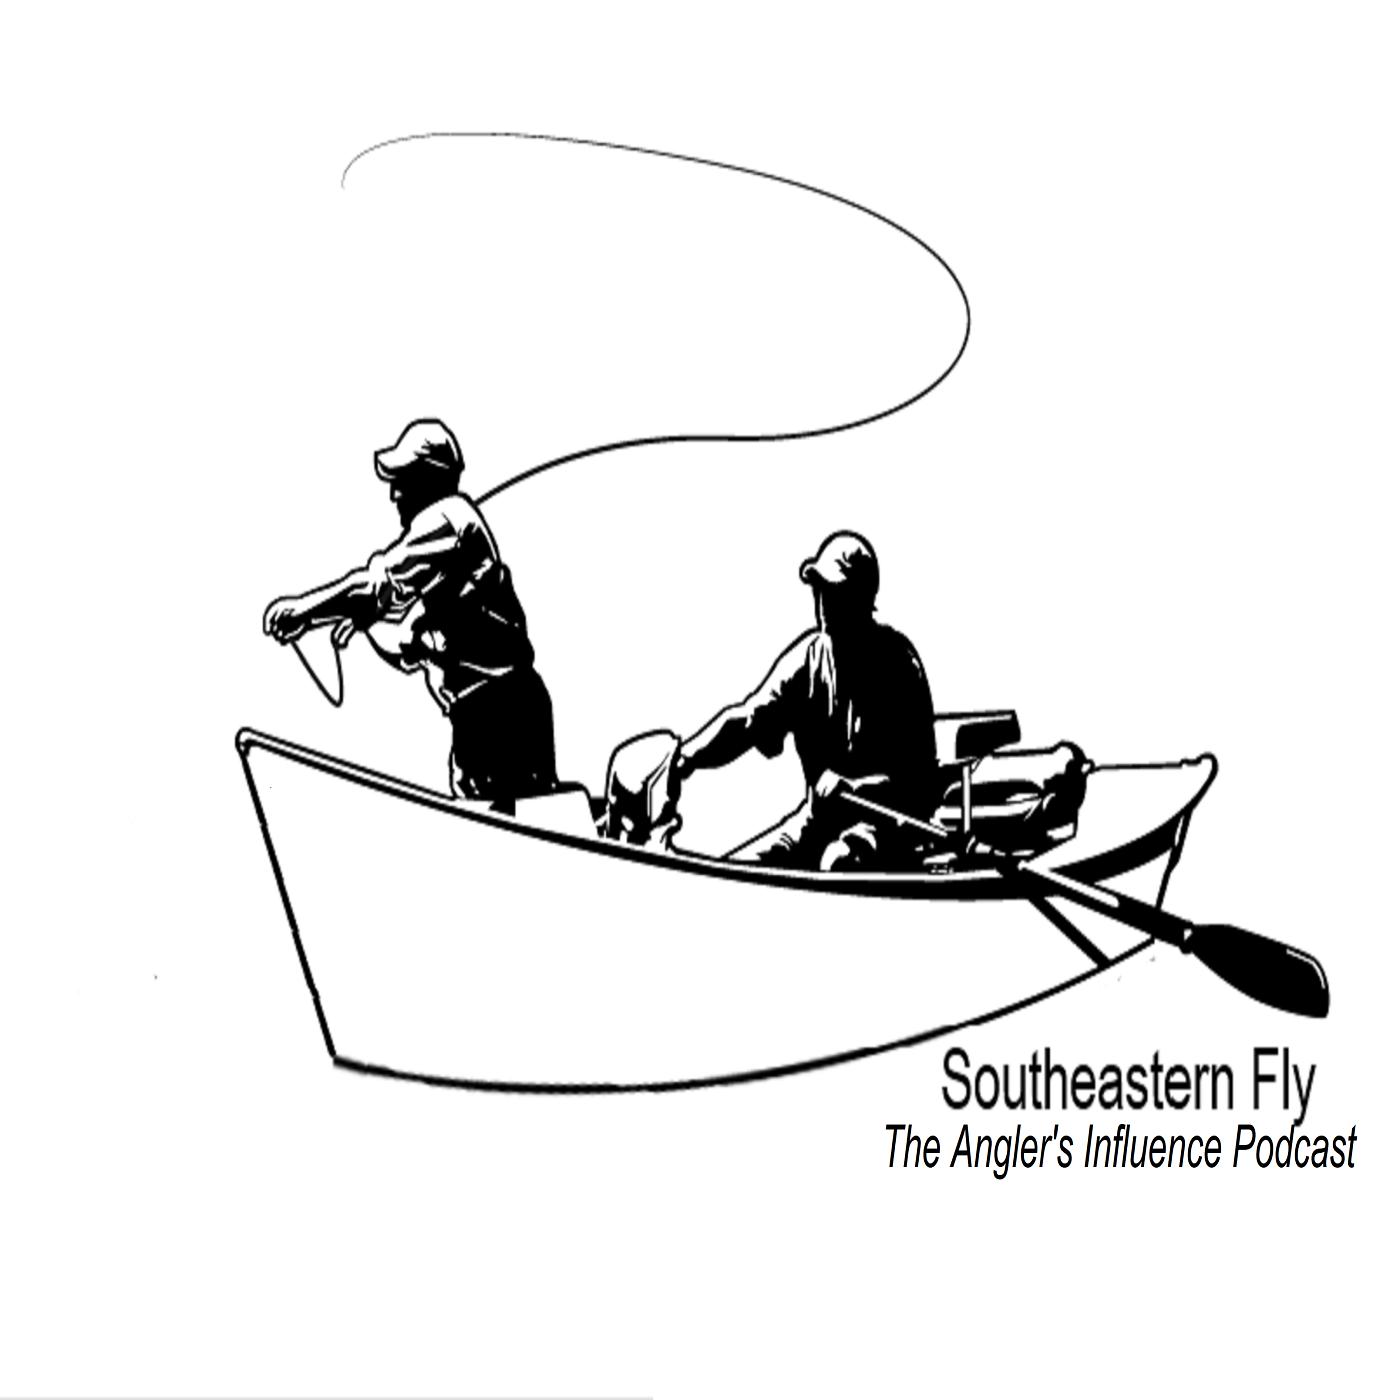 Southeastern Fly